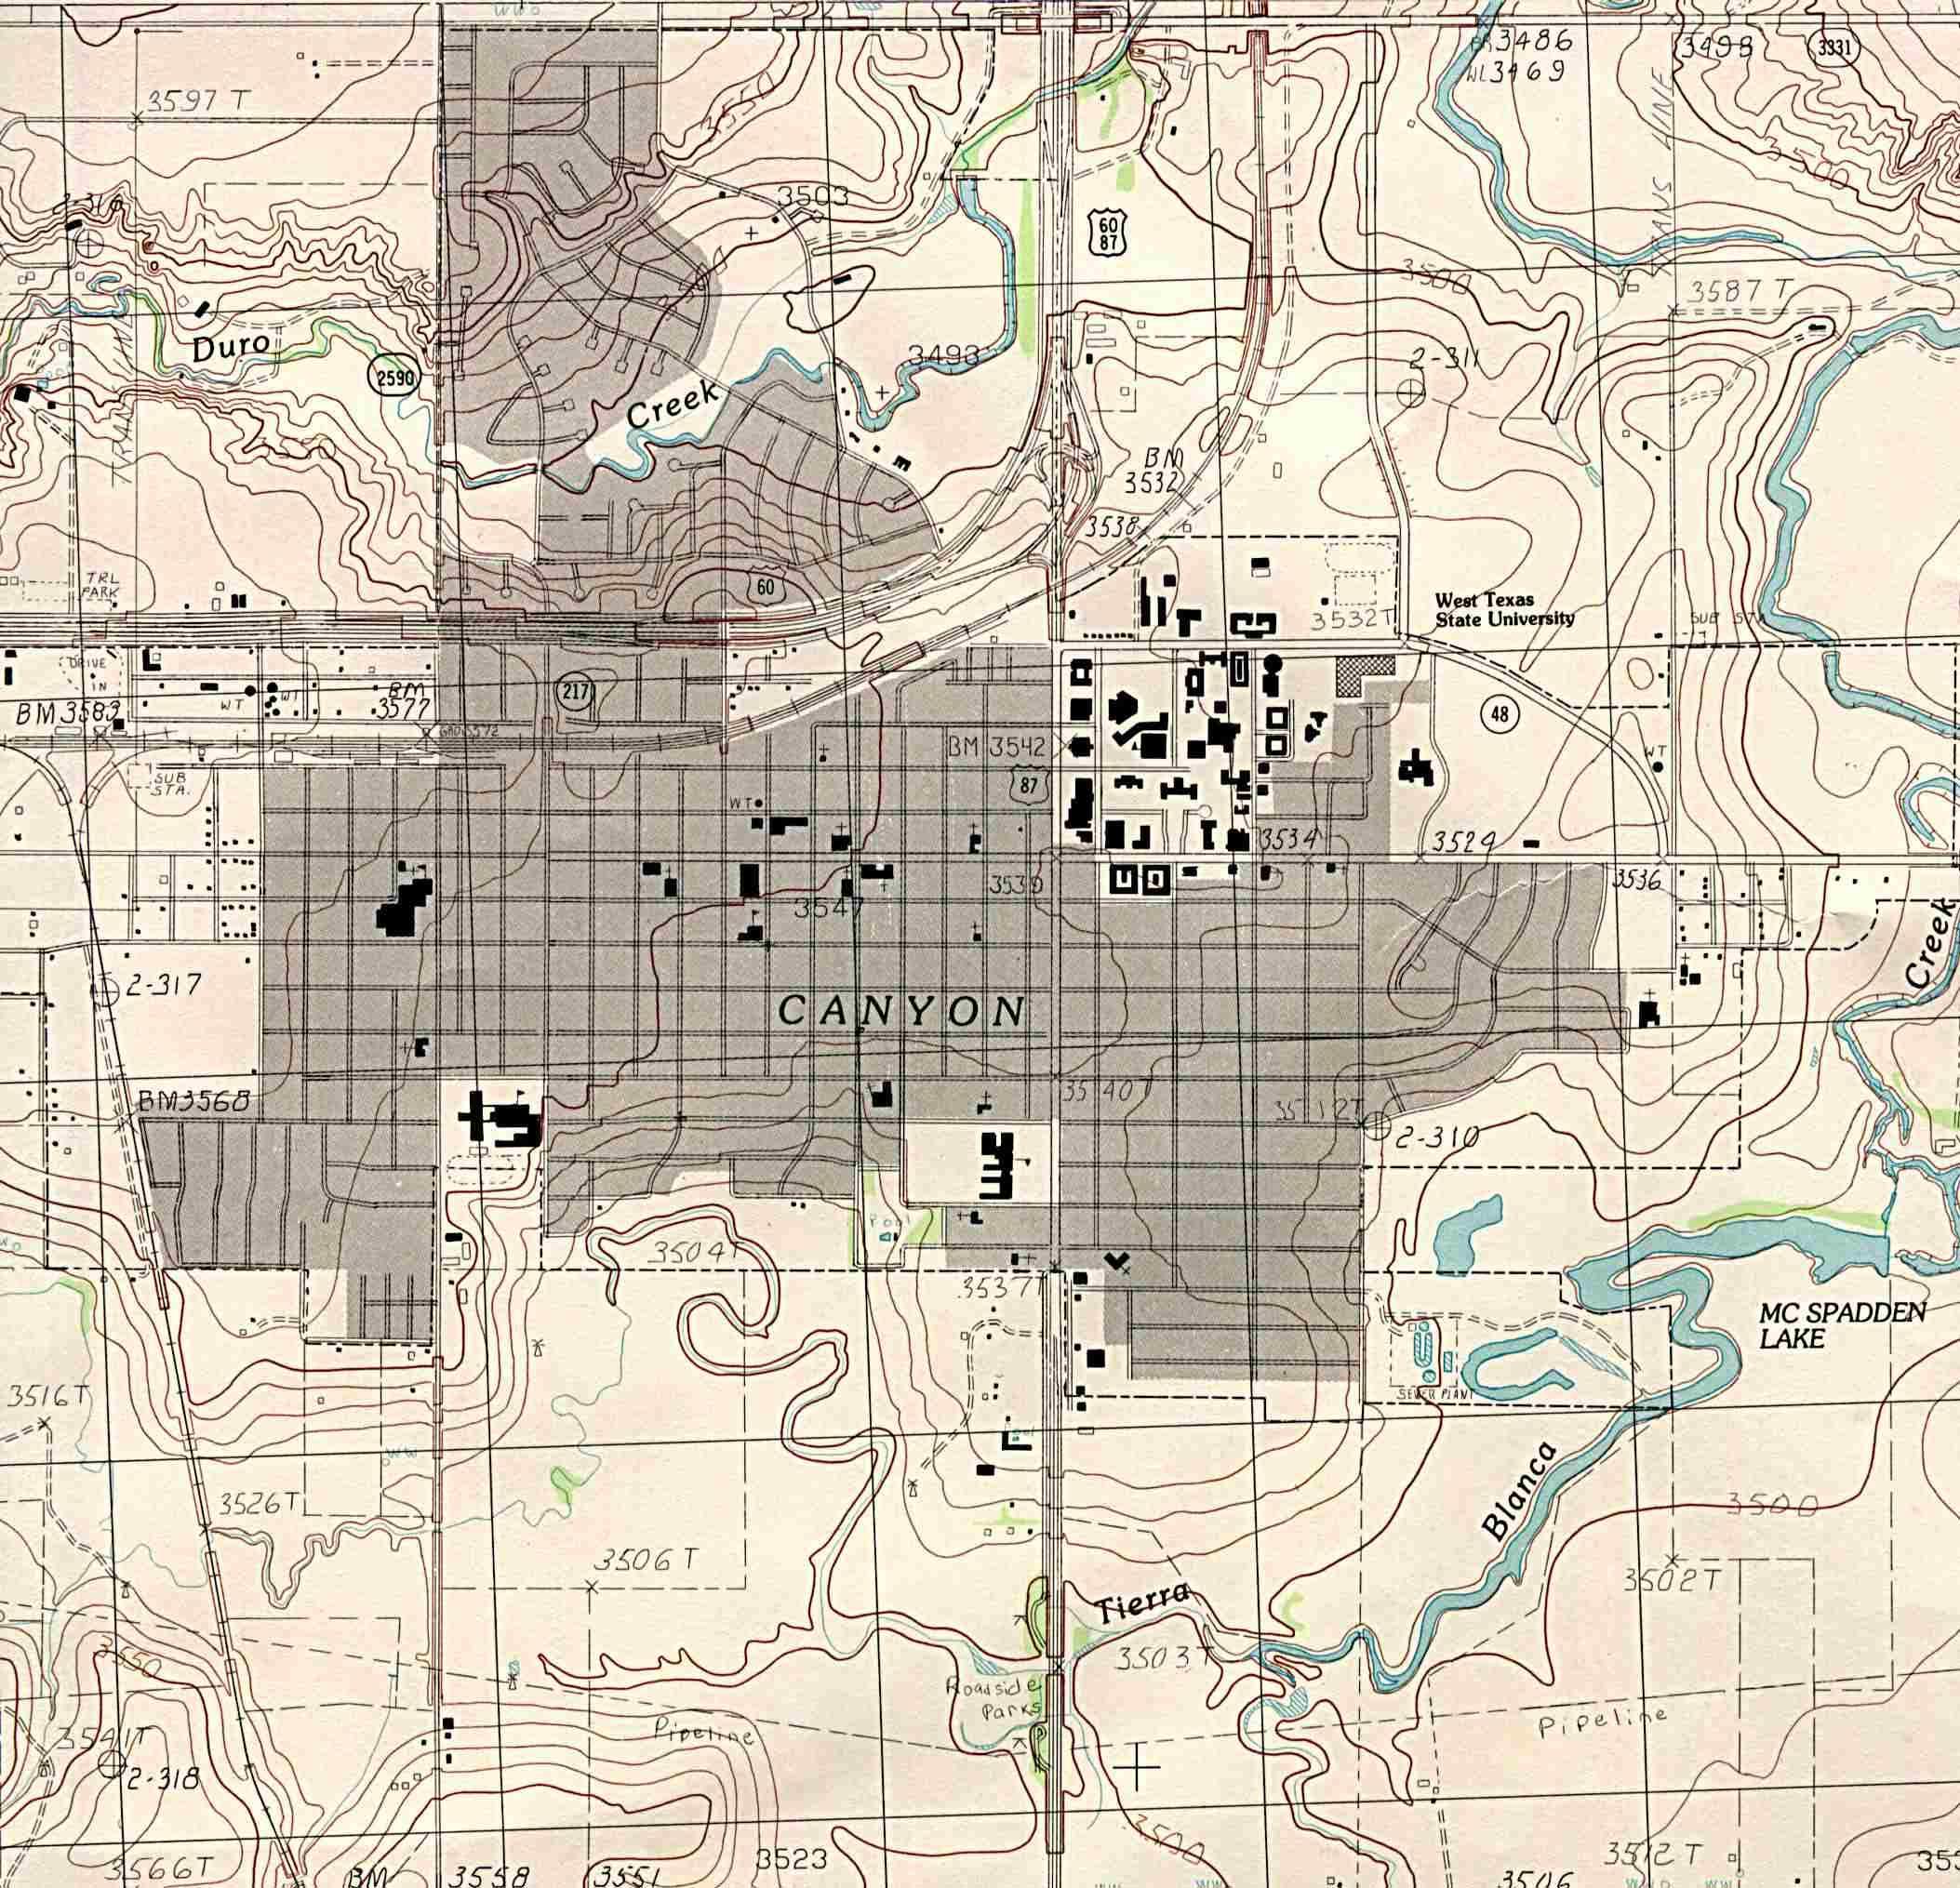 Index Of /maps/texas - Texas Map Wallpaper